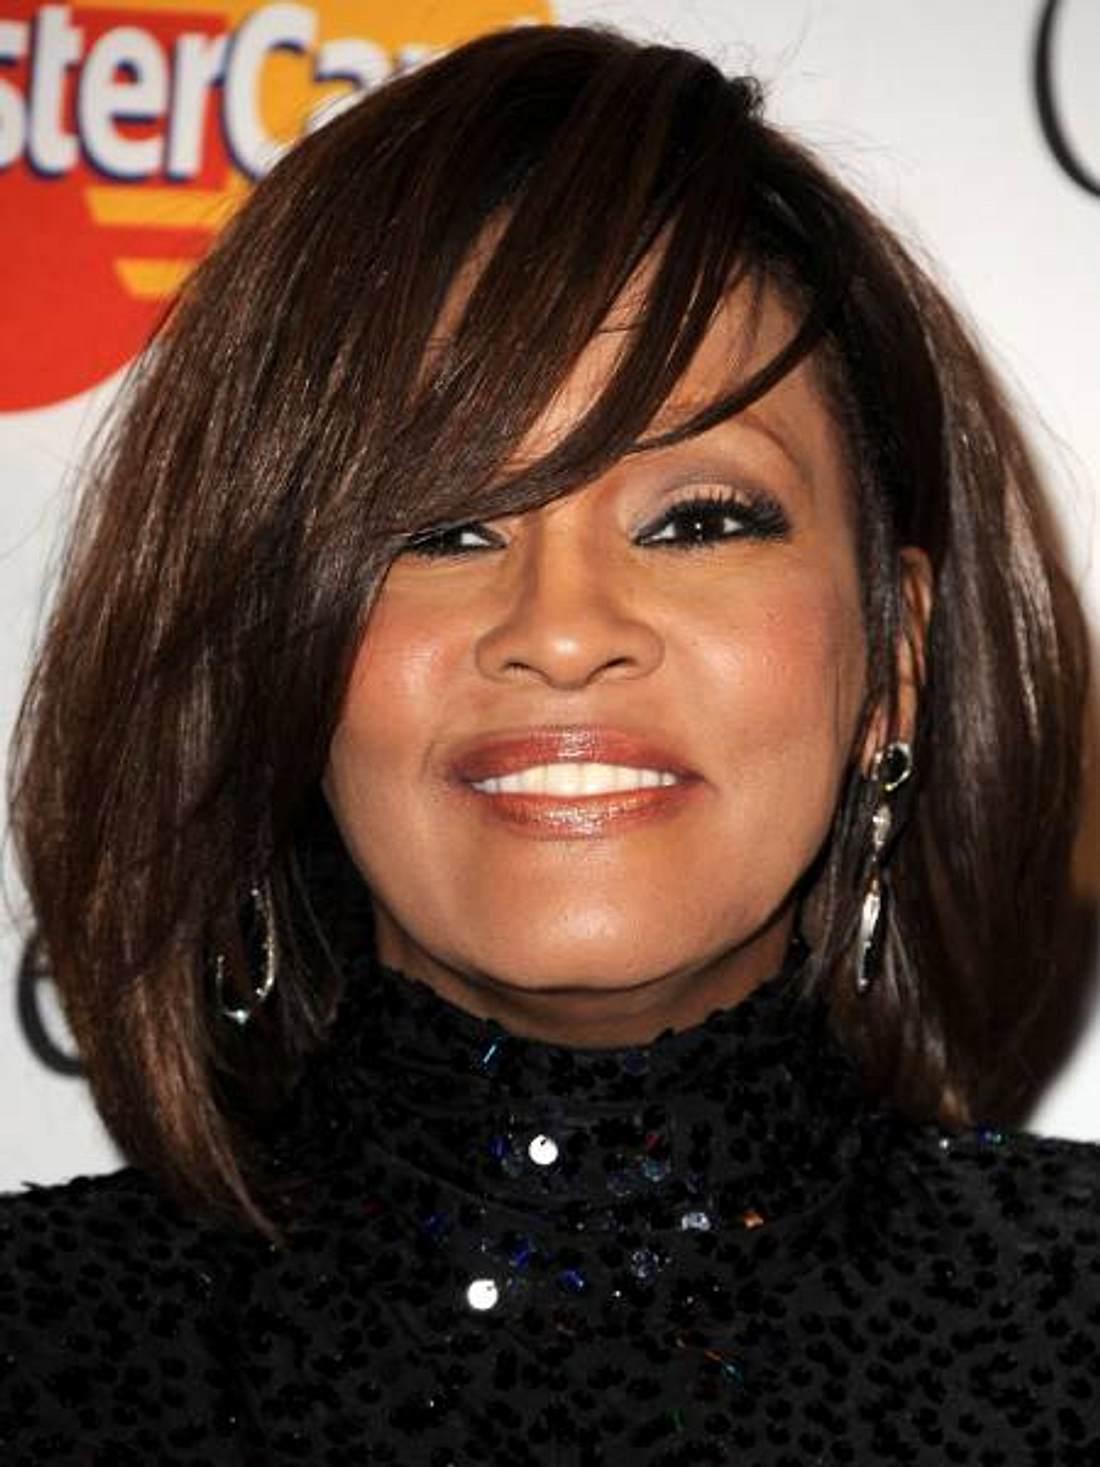 Wurde Whitney Houston ermordet?